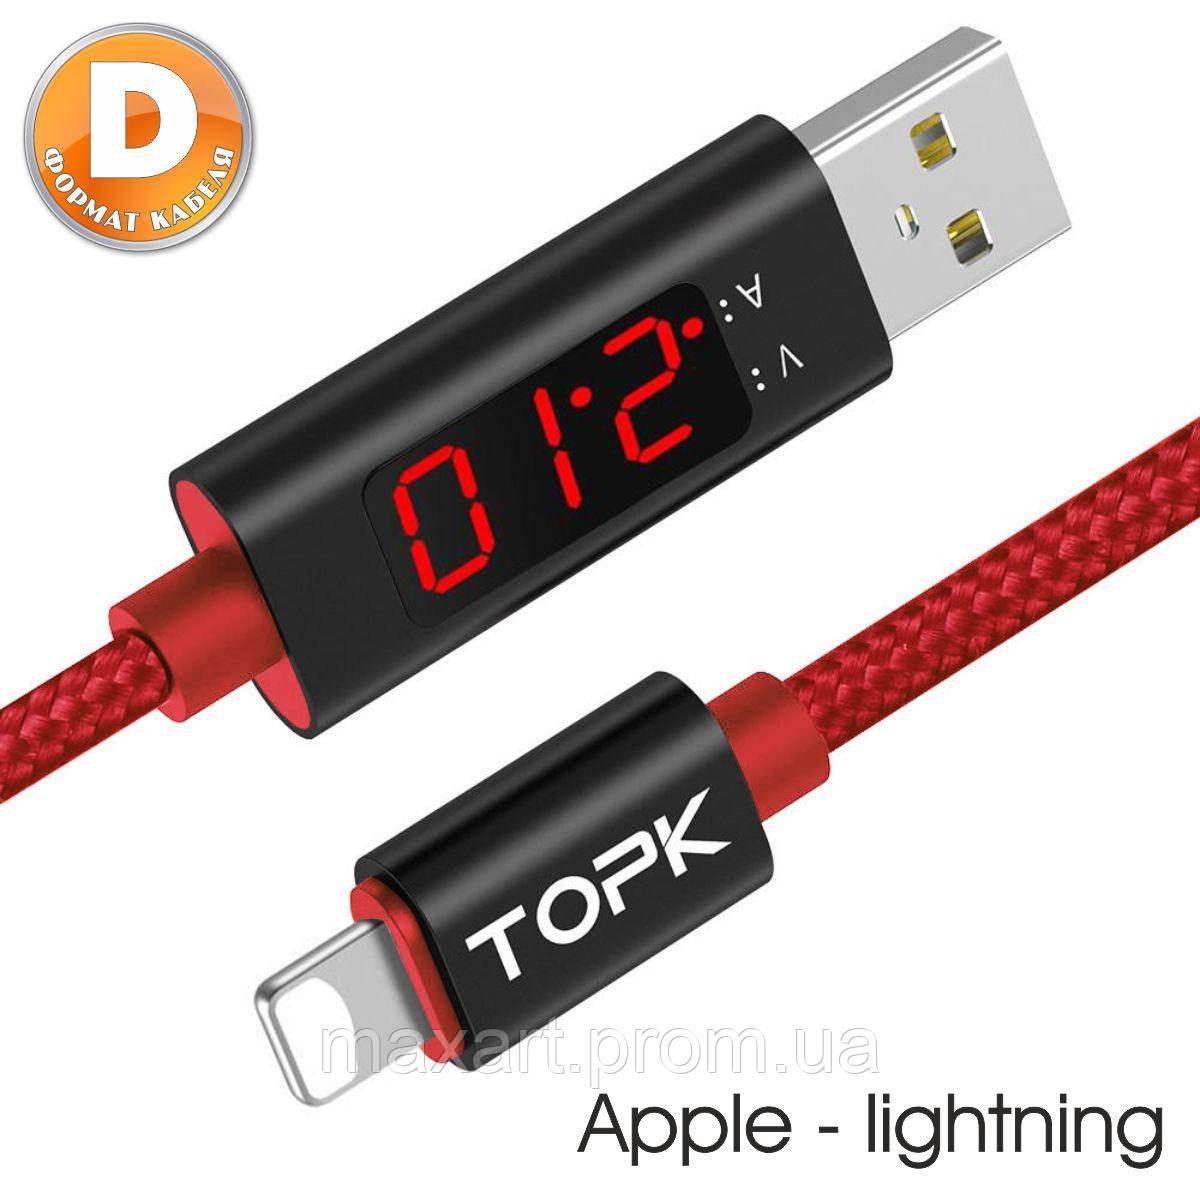 Кабель USB TOPK (D-line) Apple-lightning (100 см) Red 5V/2,1A